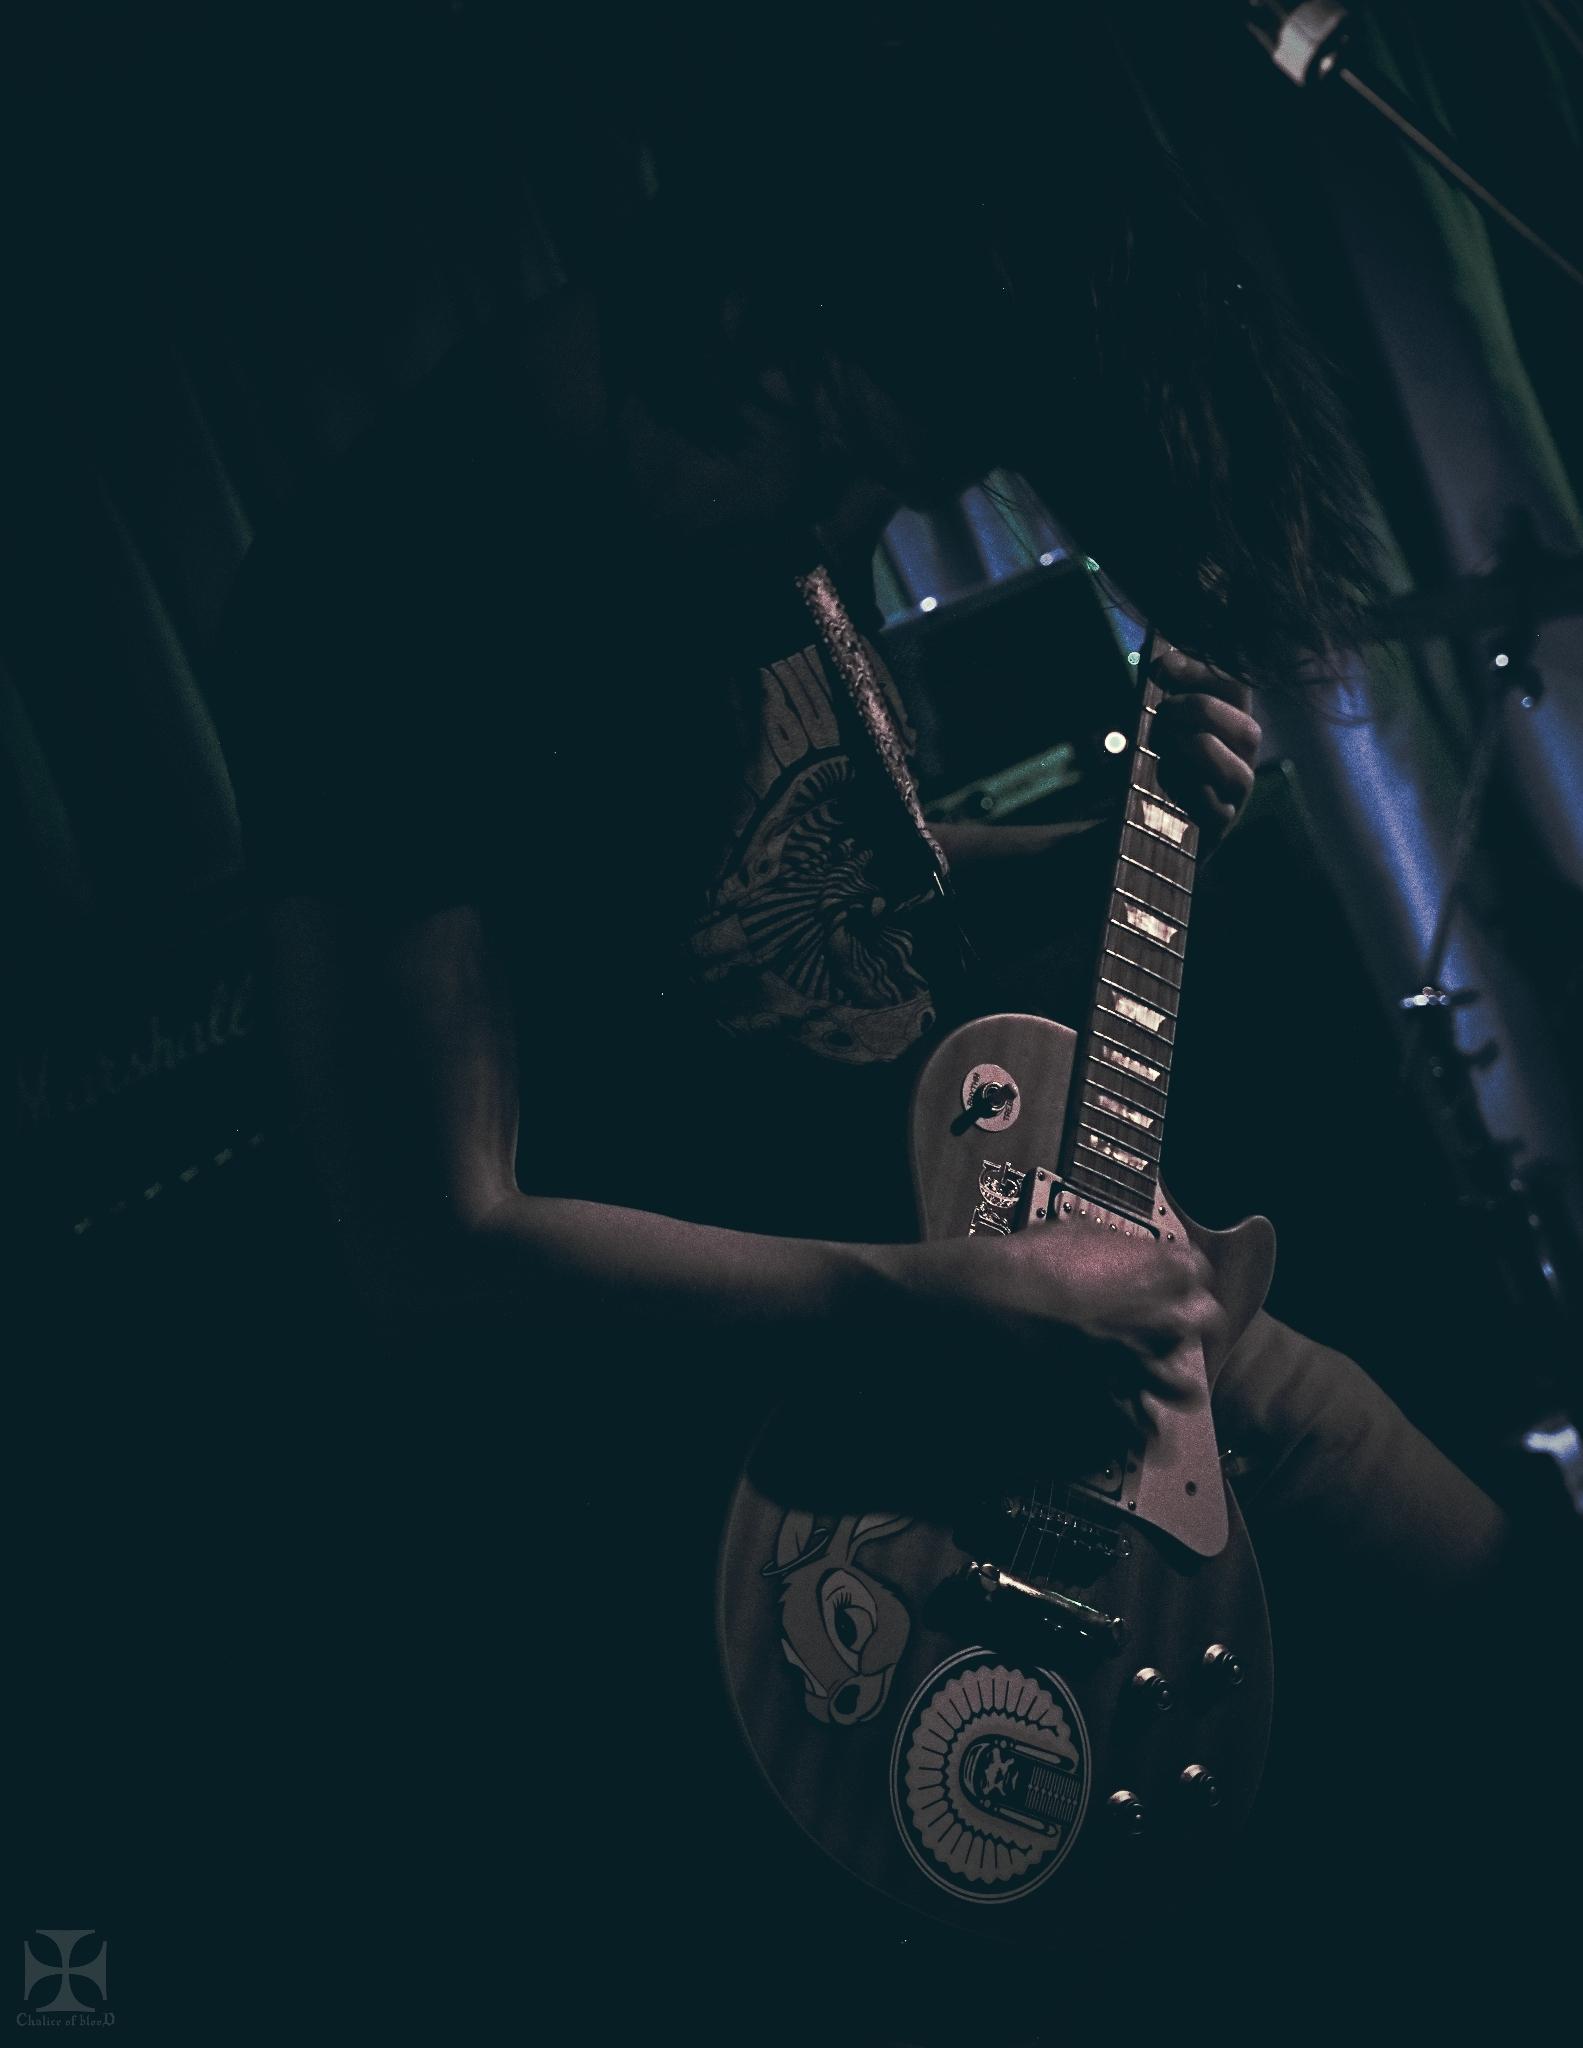 2018.09 Samsara Blues Experiment - 0088-Exposure.jpg